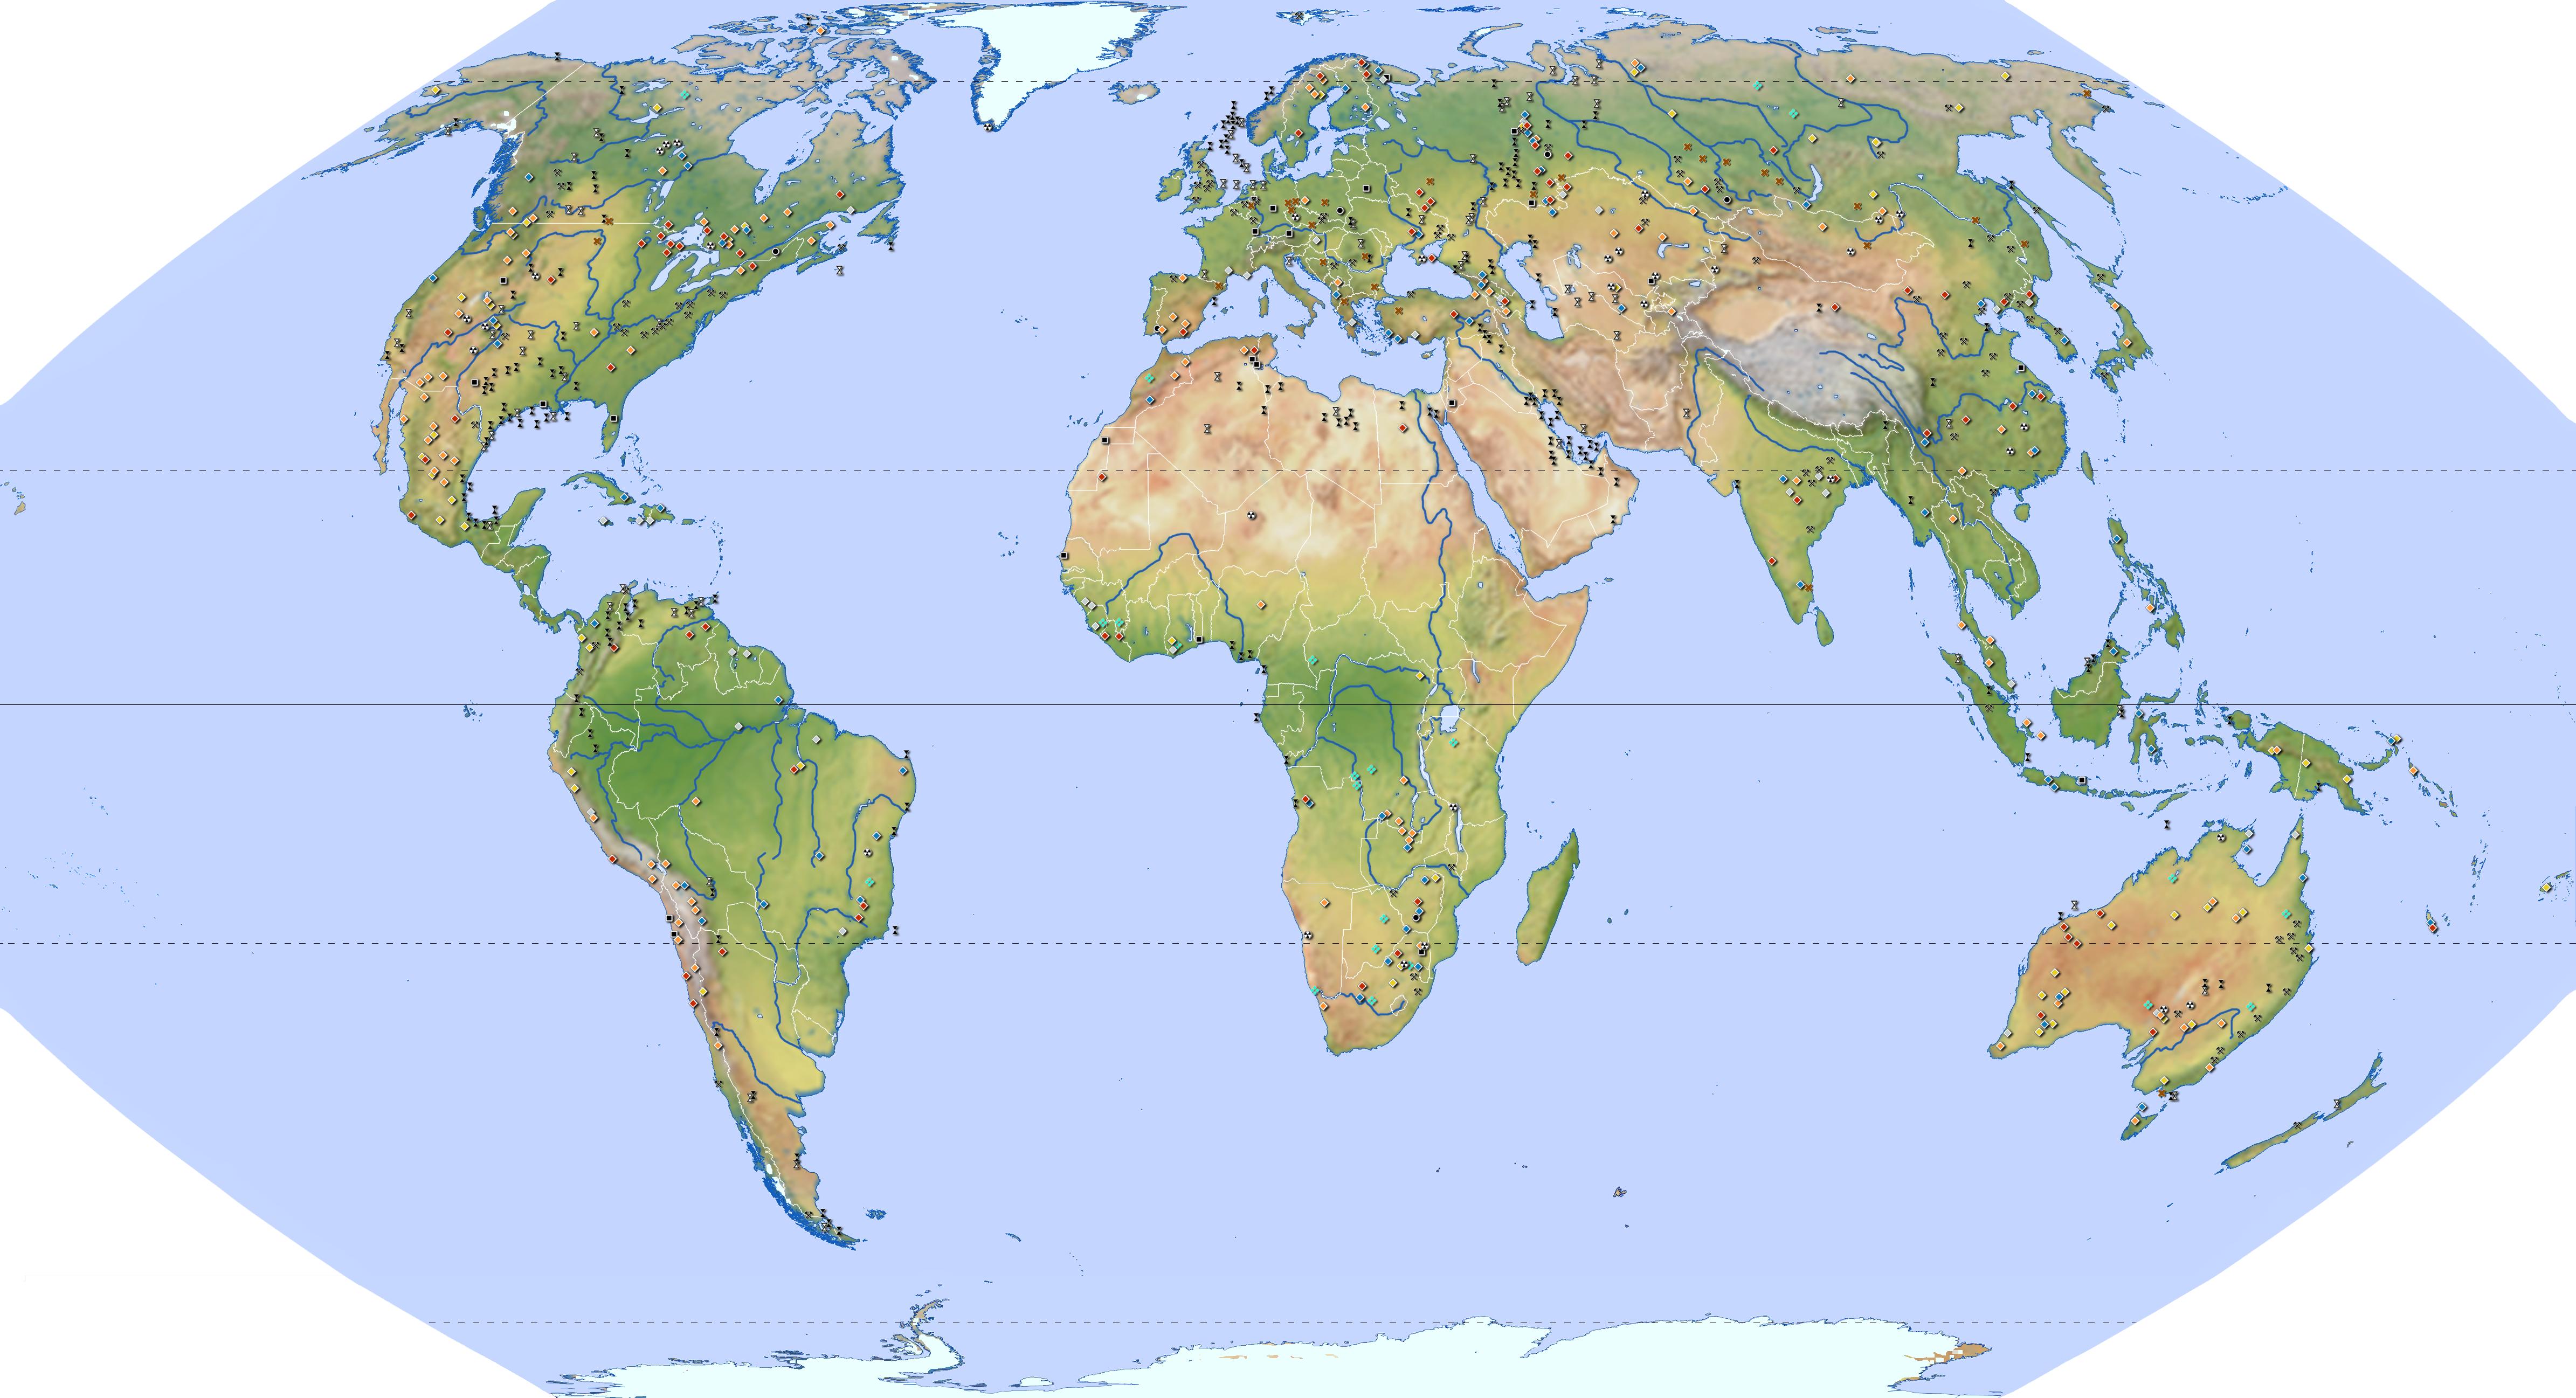 Karte Erde.File Weltkarte Bergbau Png Wikimedia Commons